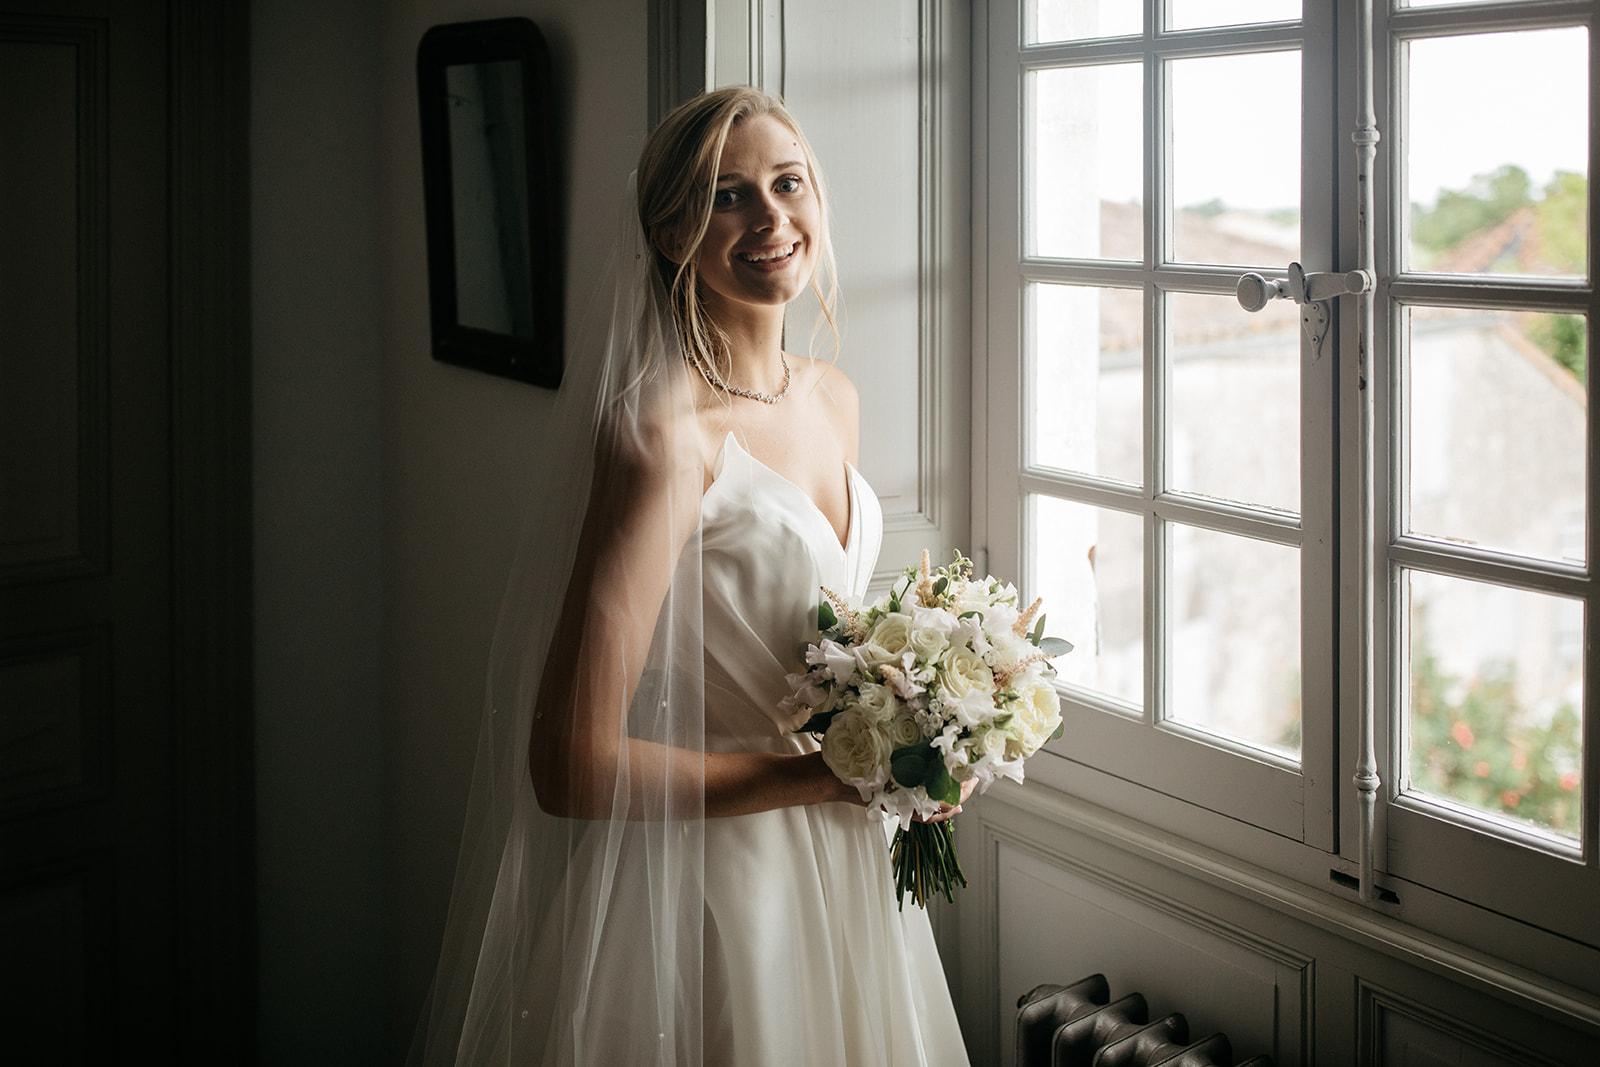 163-Madison-Joren-Wedding-Jarnac-2018-IMG_5454.jpg